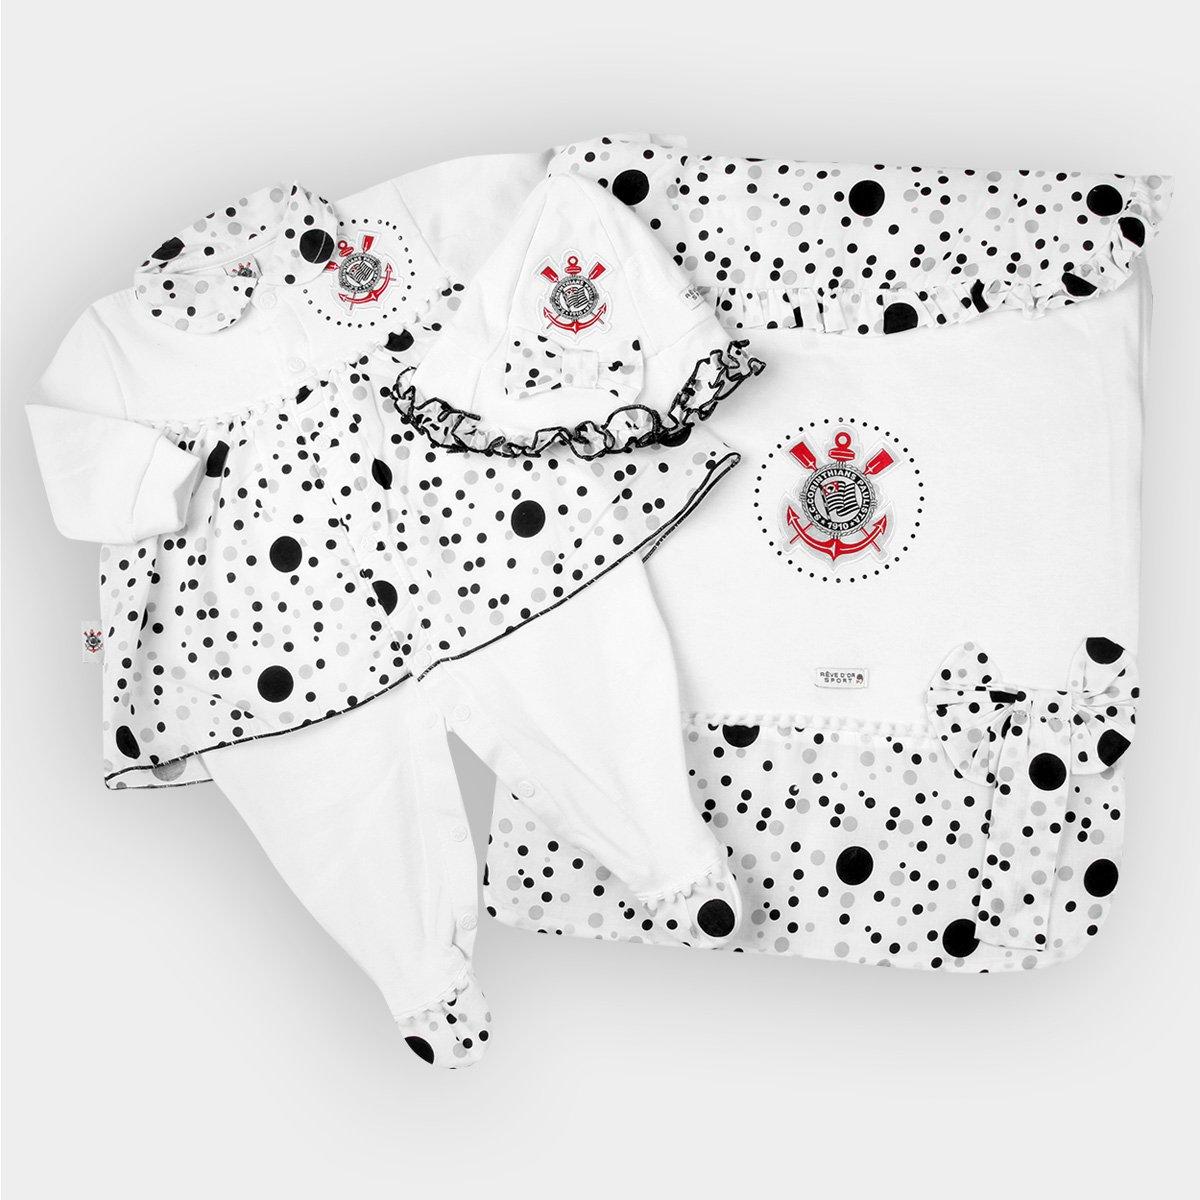 Kit Maternidade Corinthians Bebê Vestido